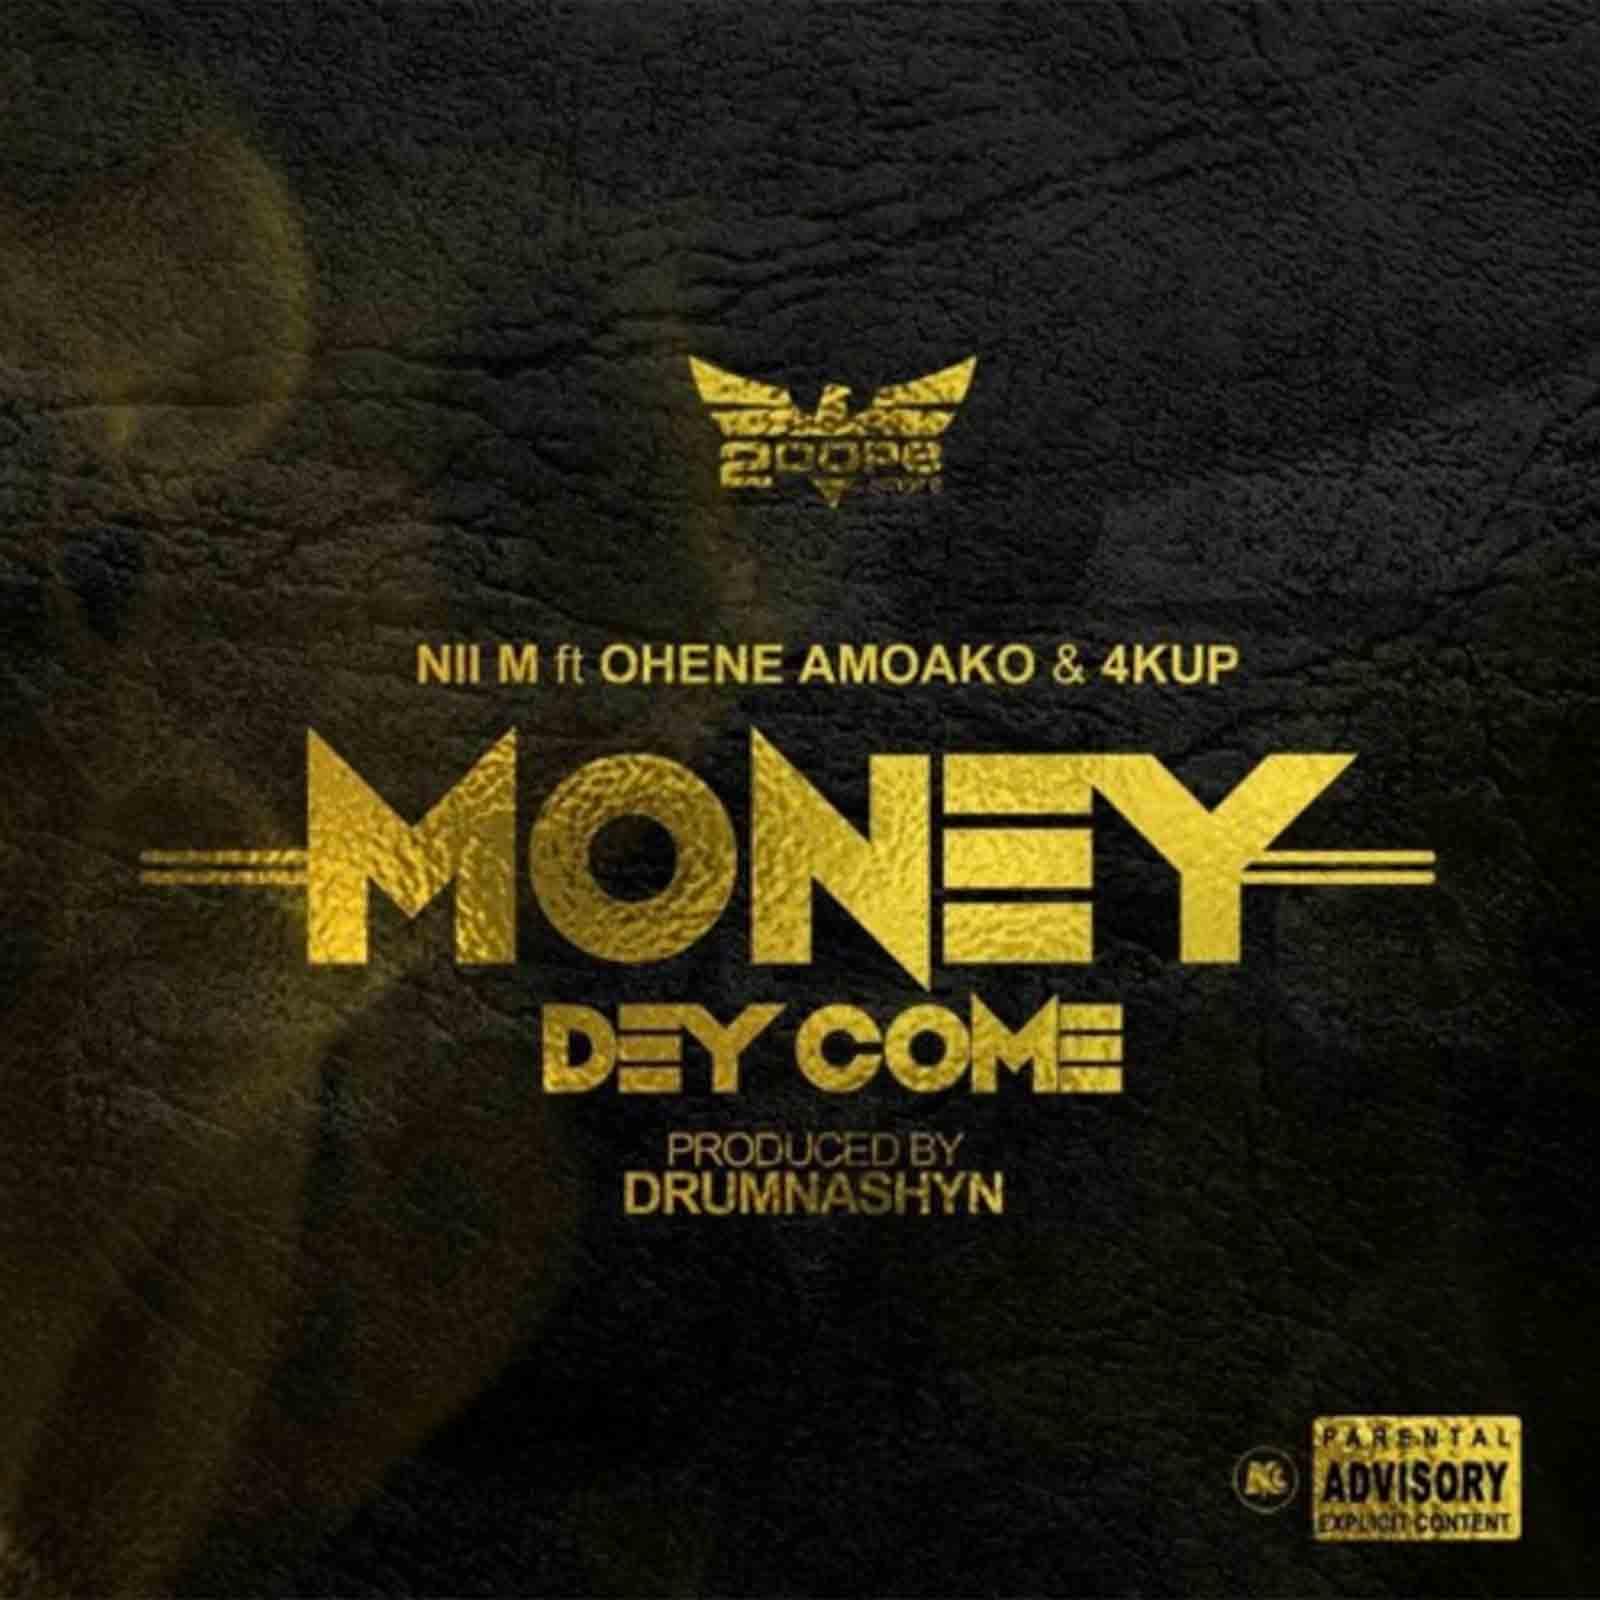 Money Dey Come by Nii M feat. Ohene Amoako & 4kup